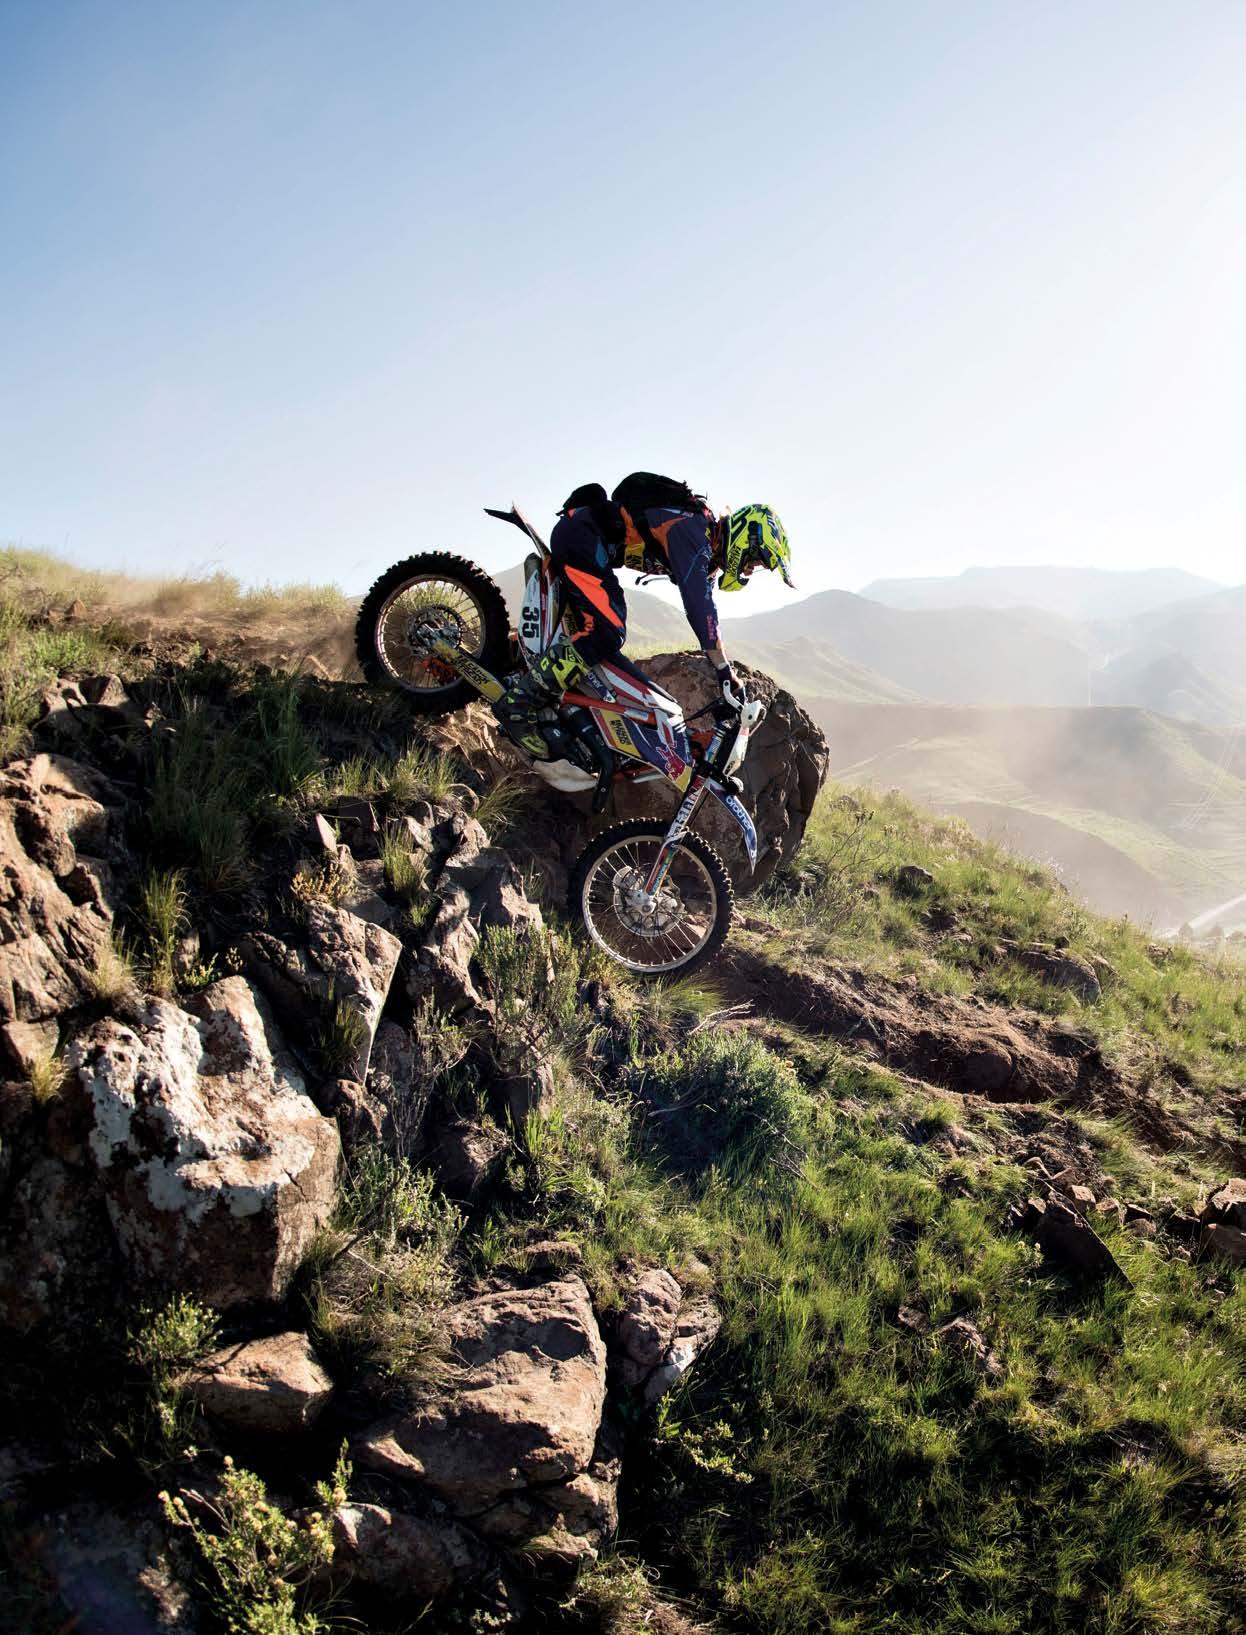 YOU CAN DO THIS . . .  Motorbike Enduro Riding